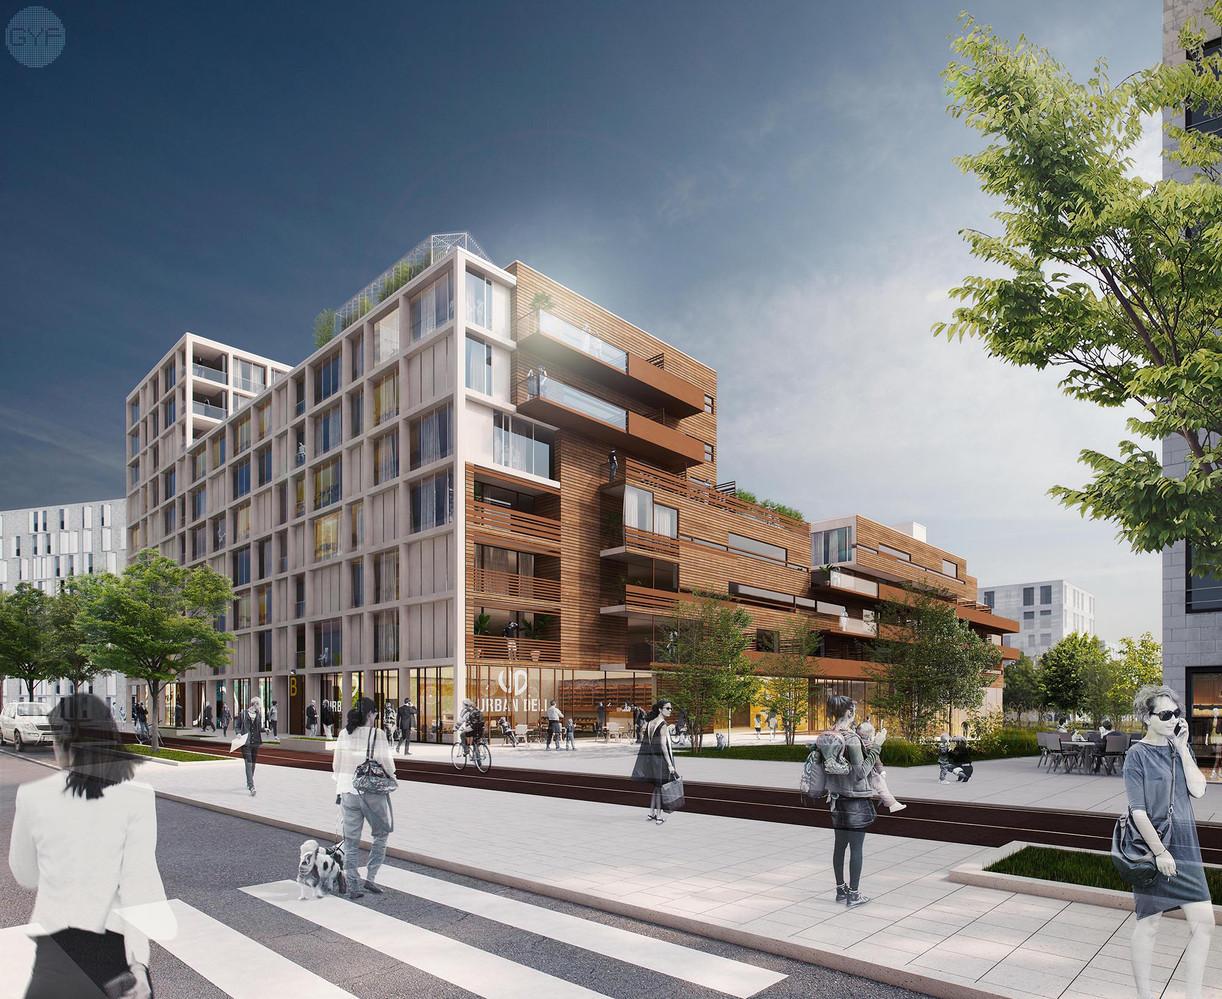 Housing Block in a new urban neighborhood